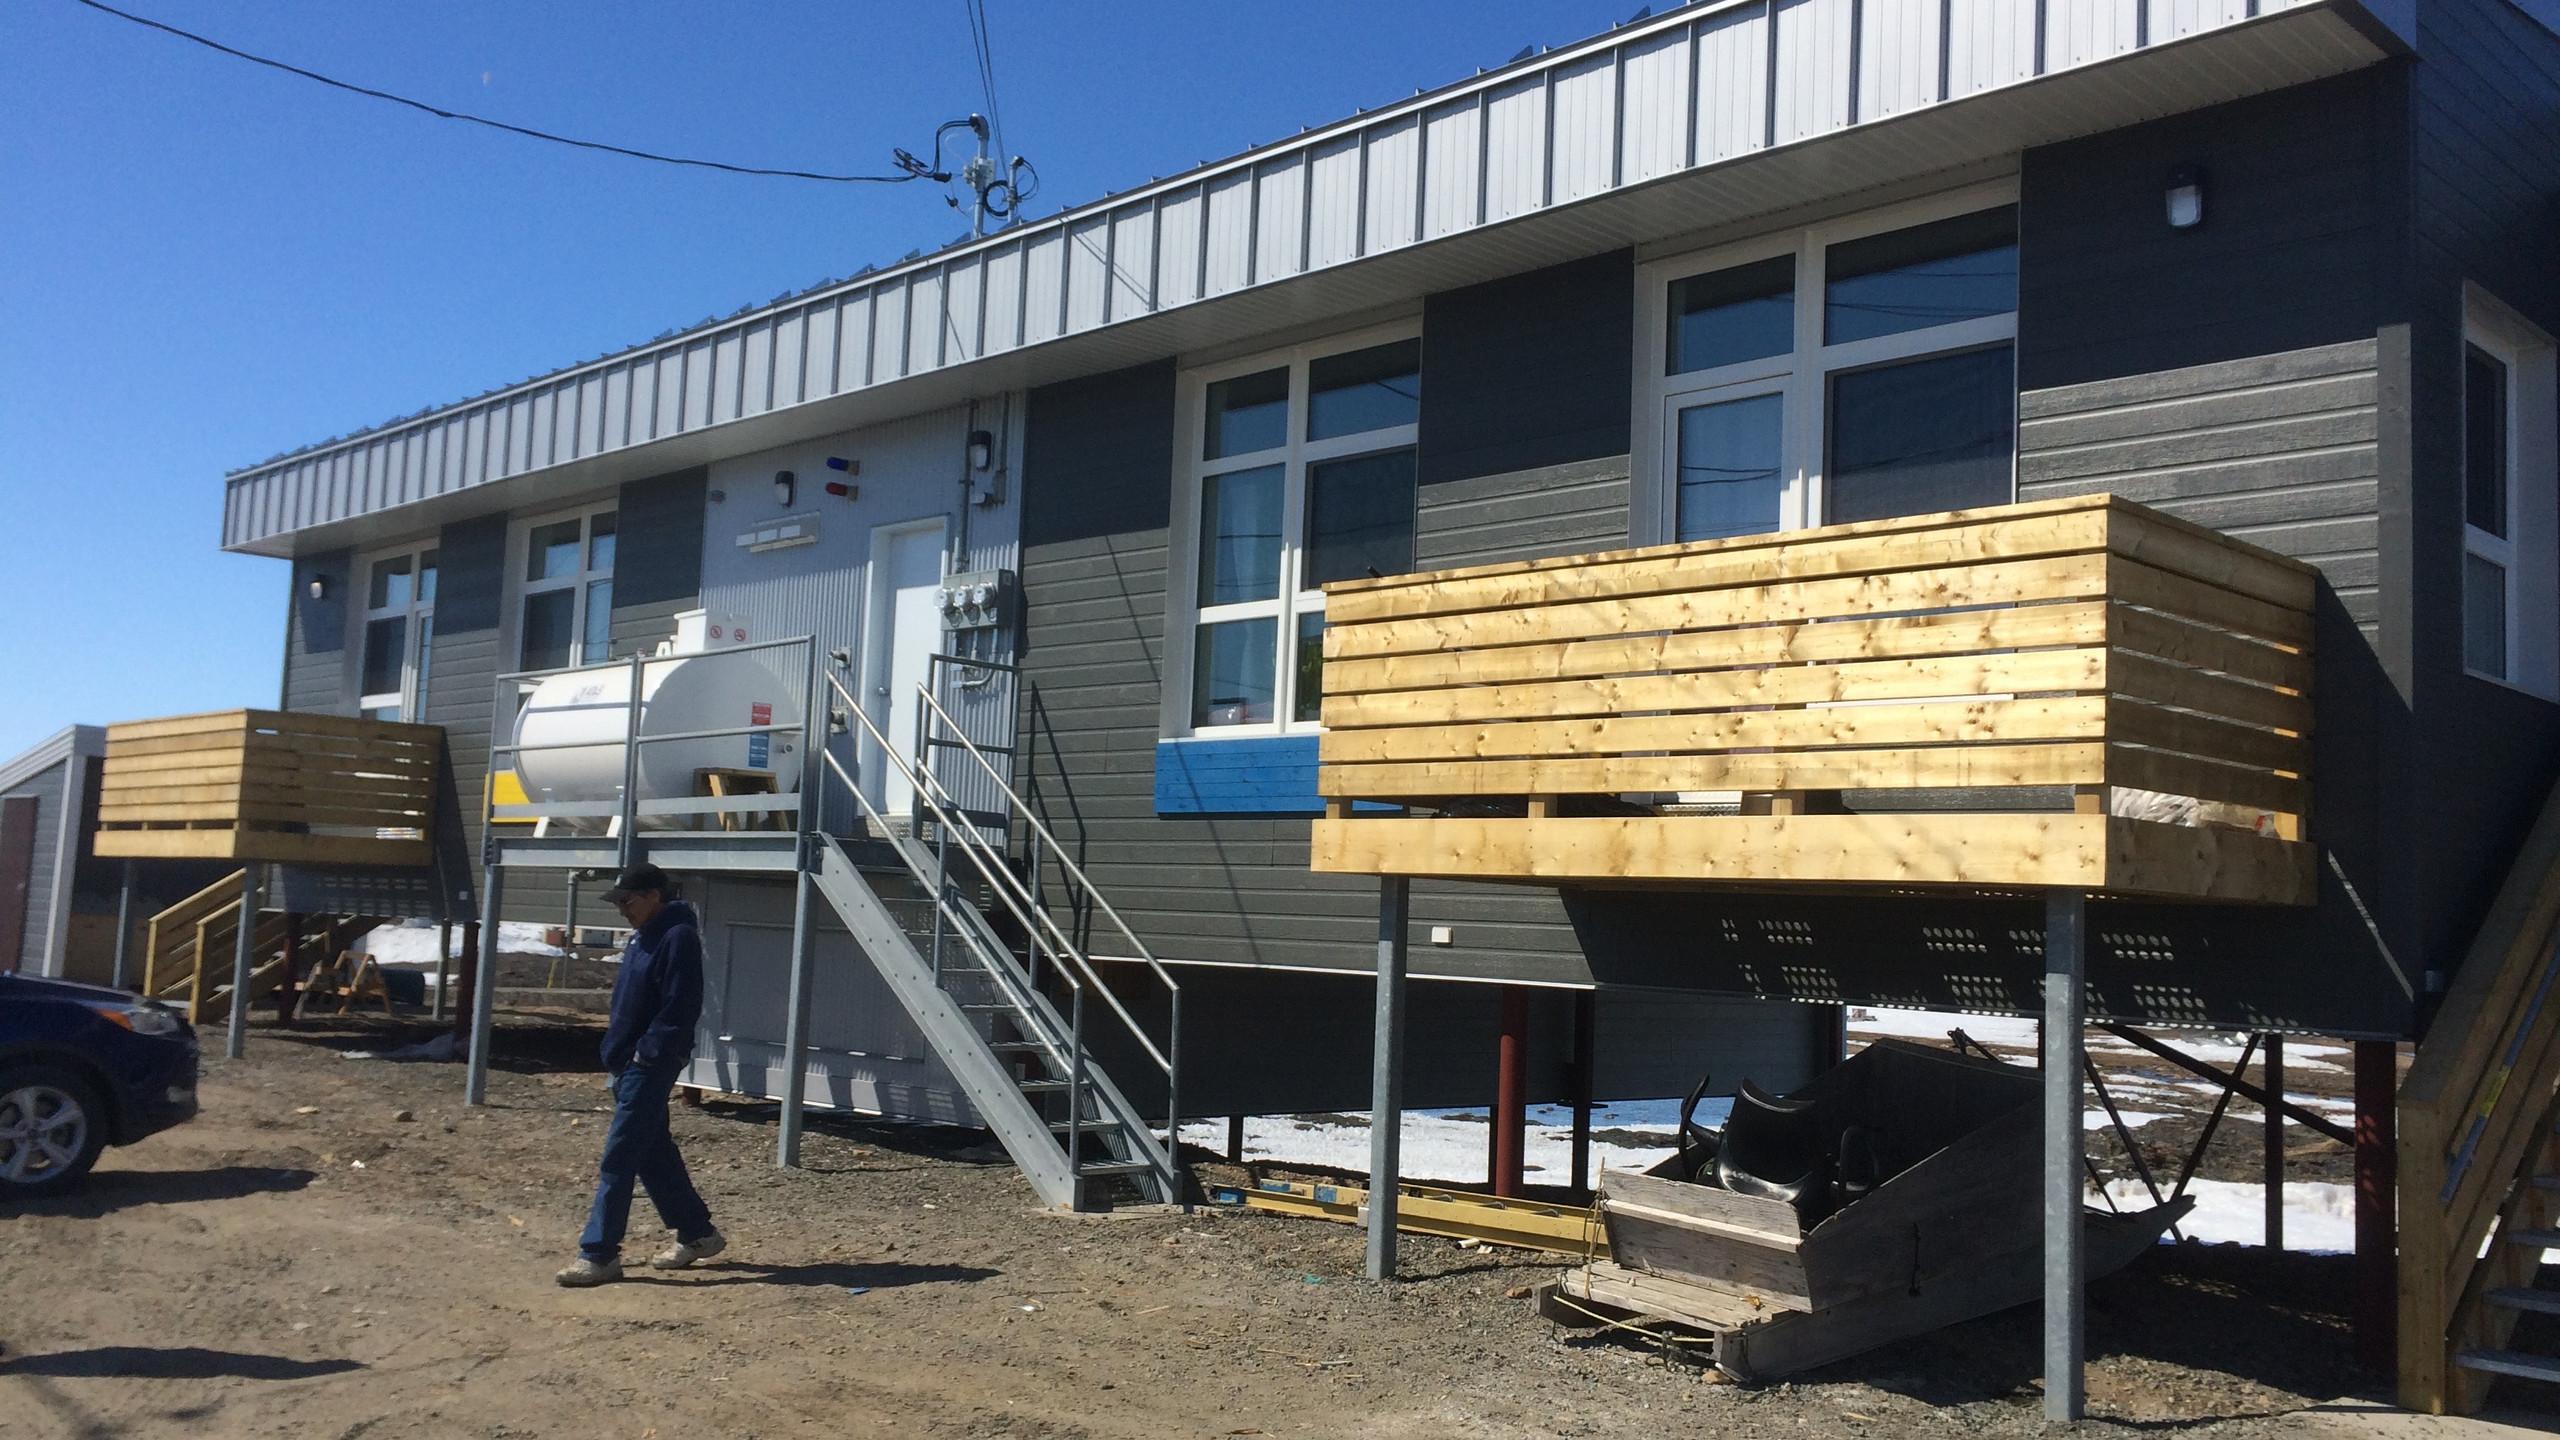 House prototype built on piles